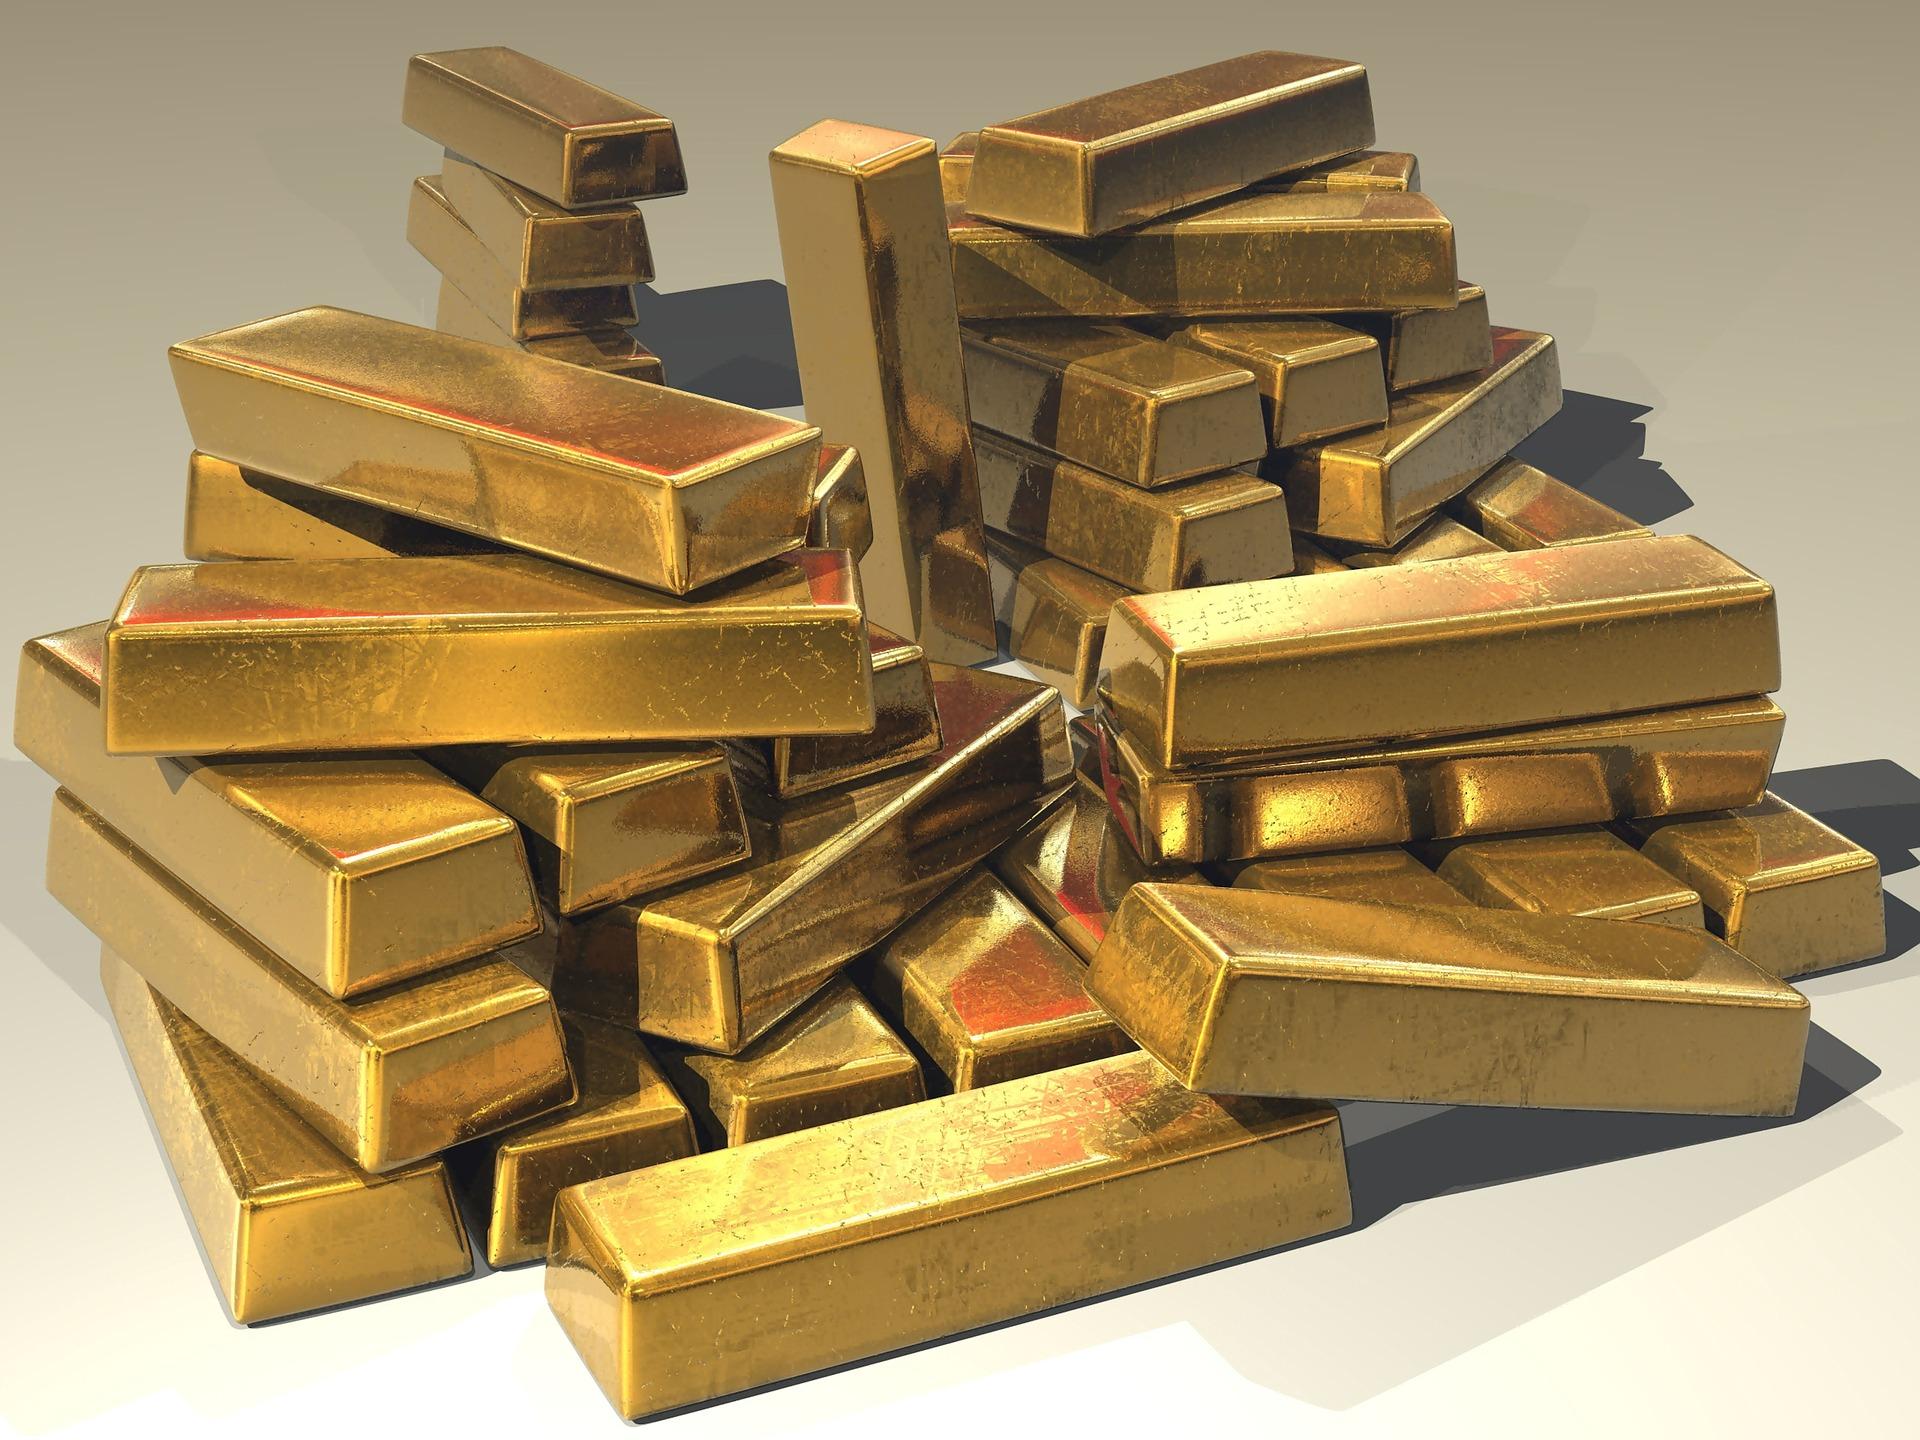 1529509143_gold-513062_1920.jpg